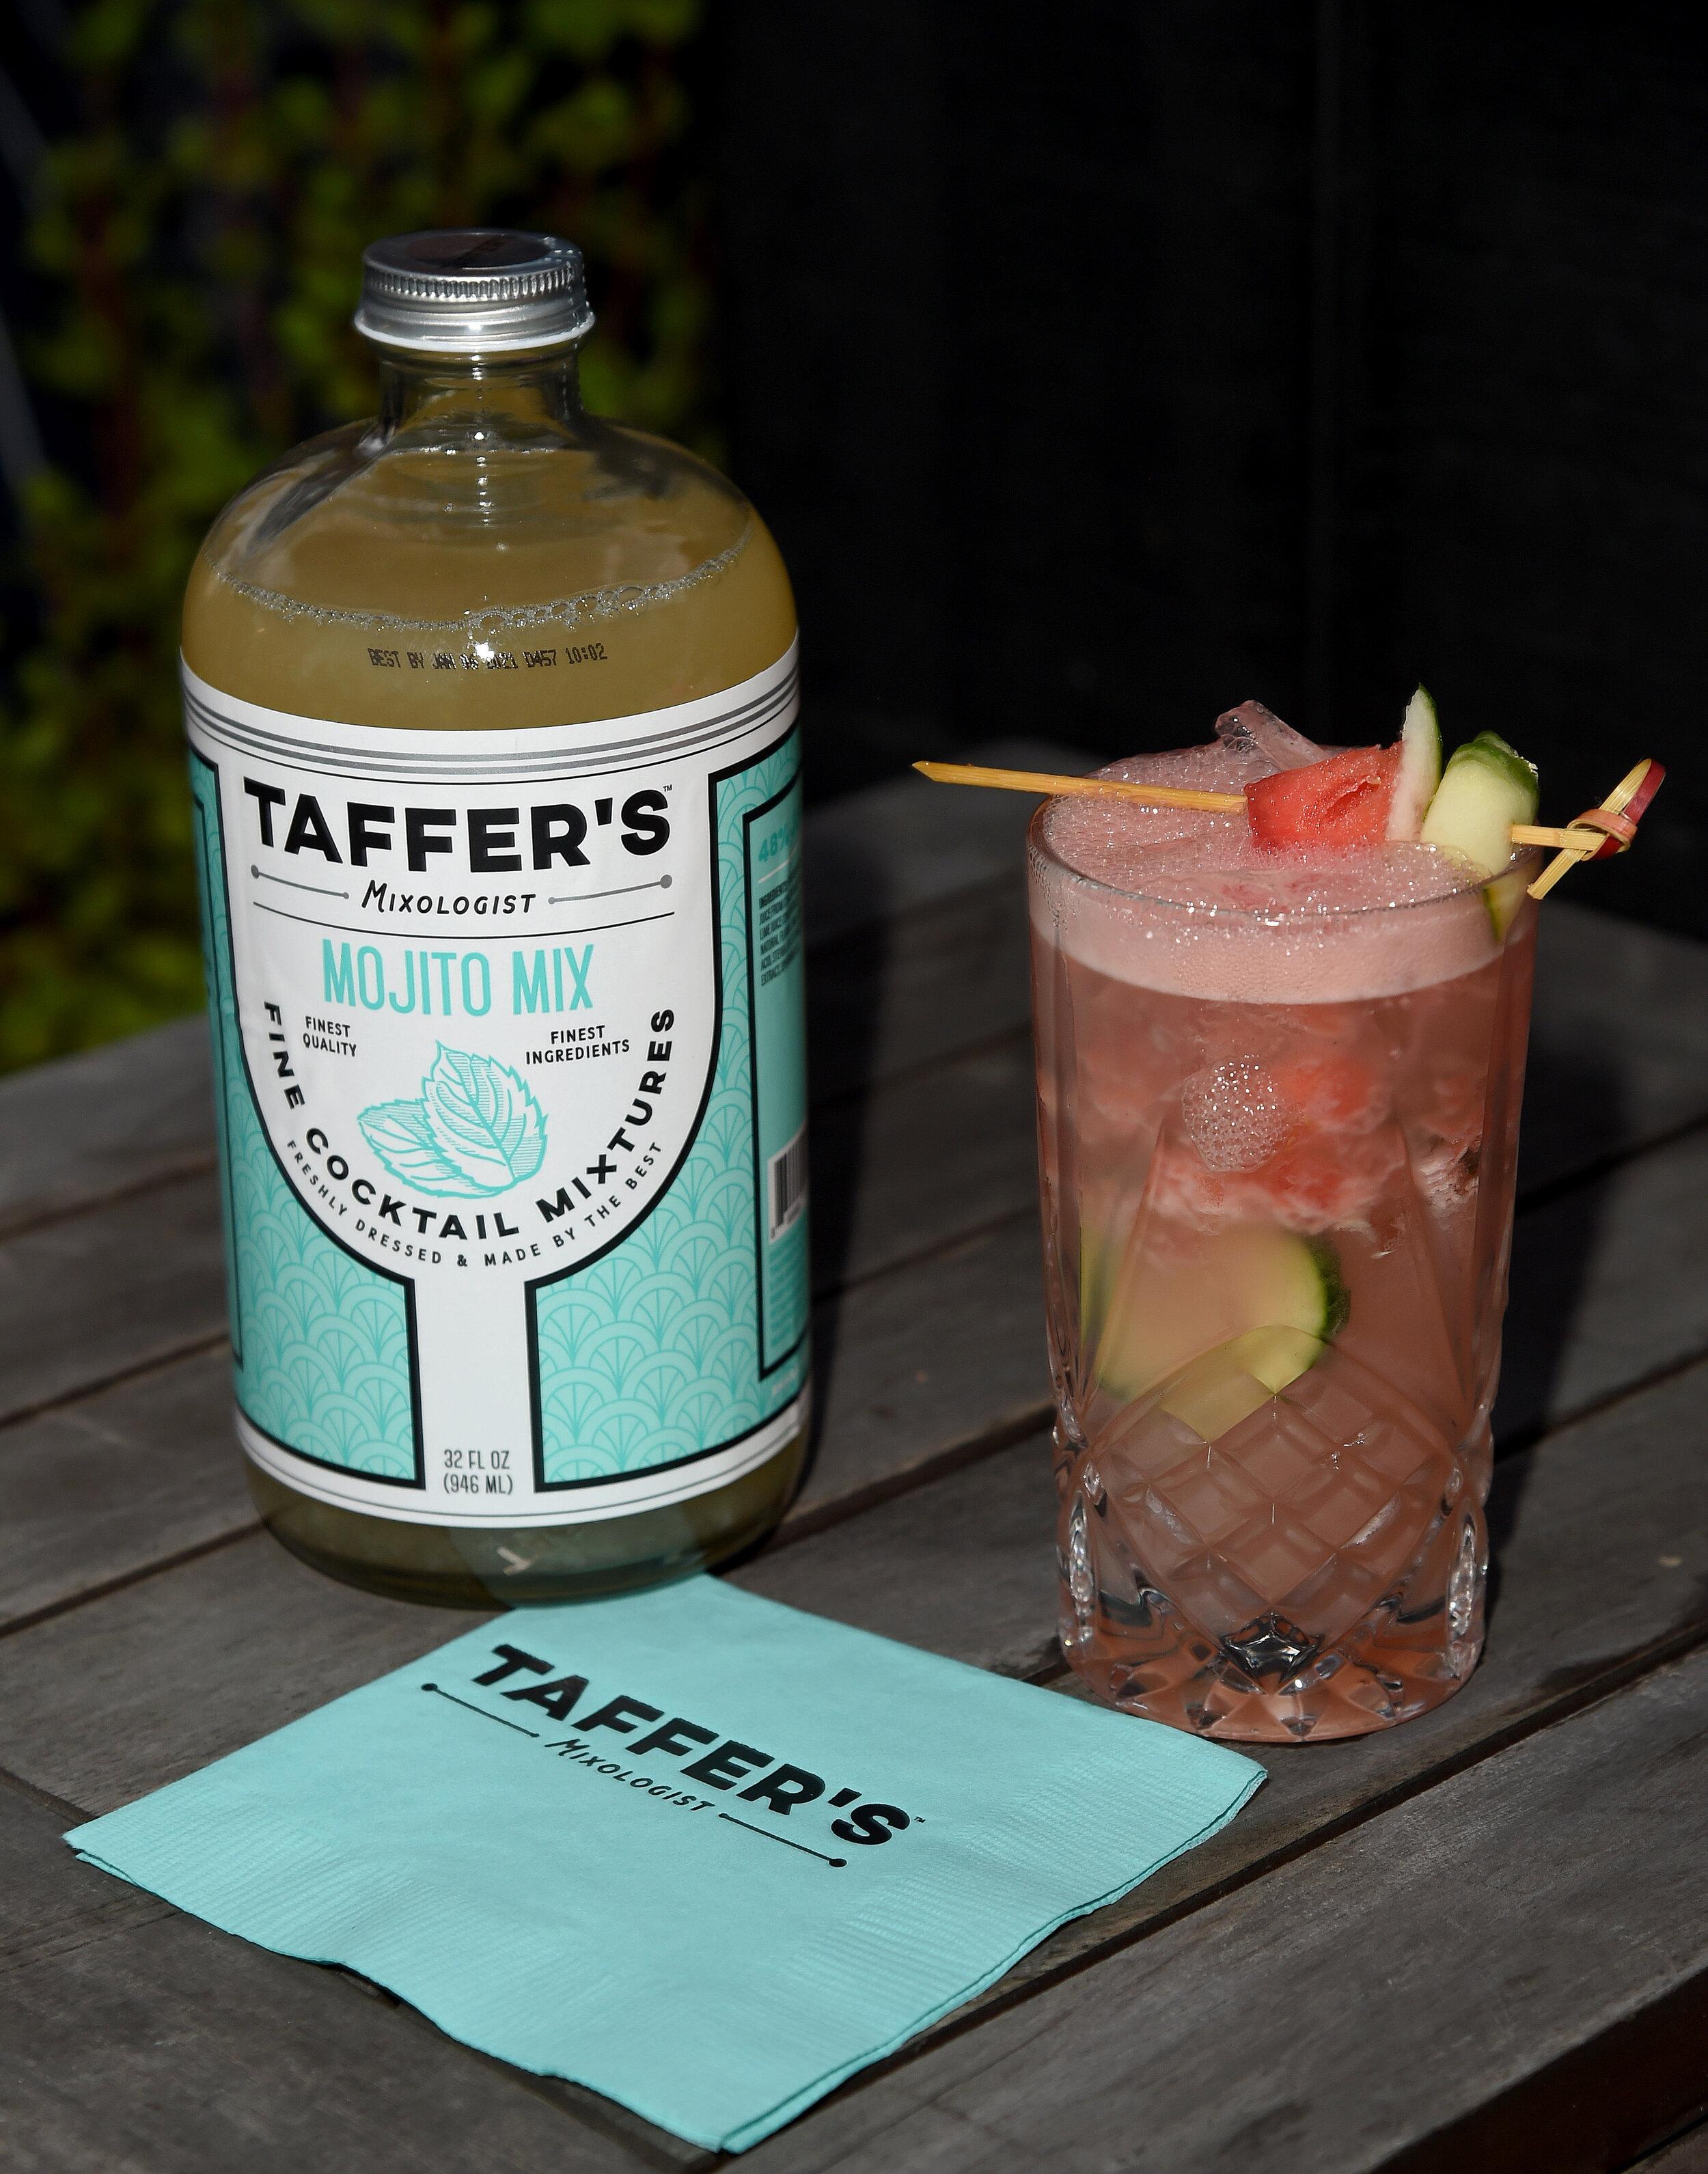 Jason Merritt/Radarpics/Shutterstock for Taffer's Mixologist